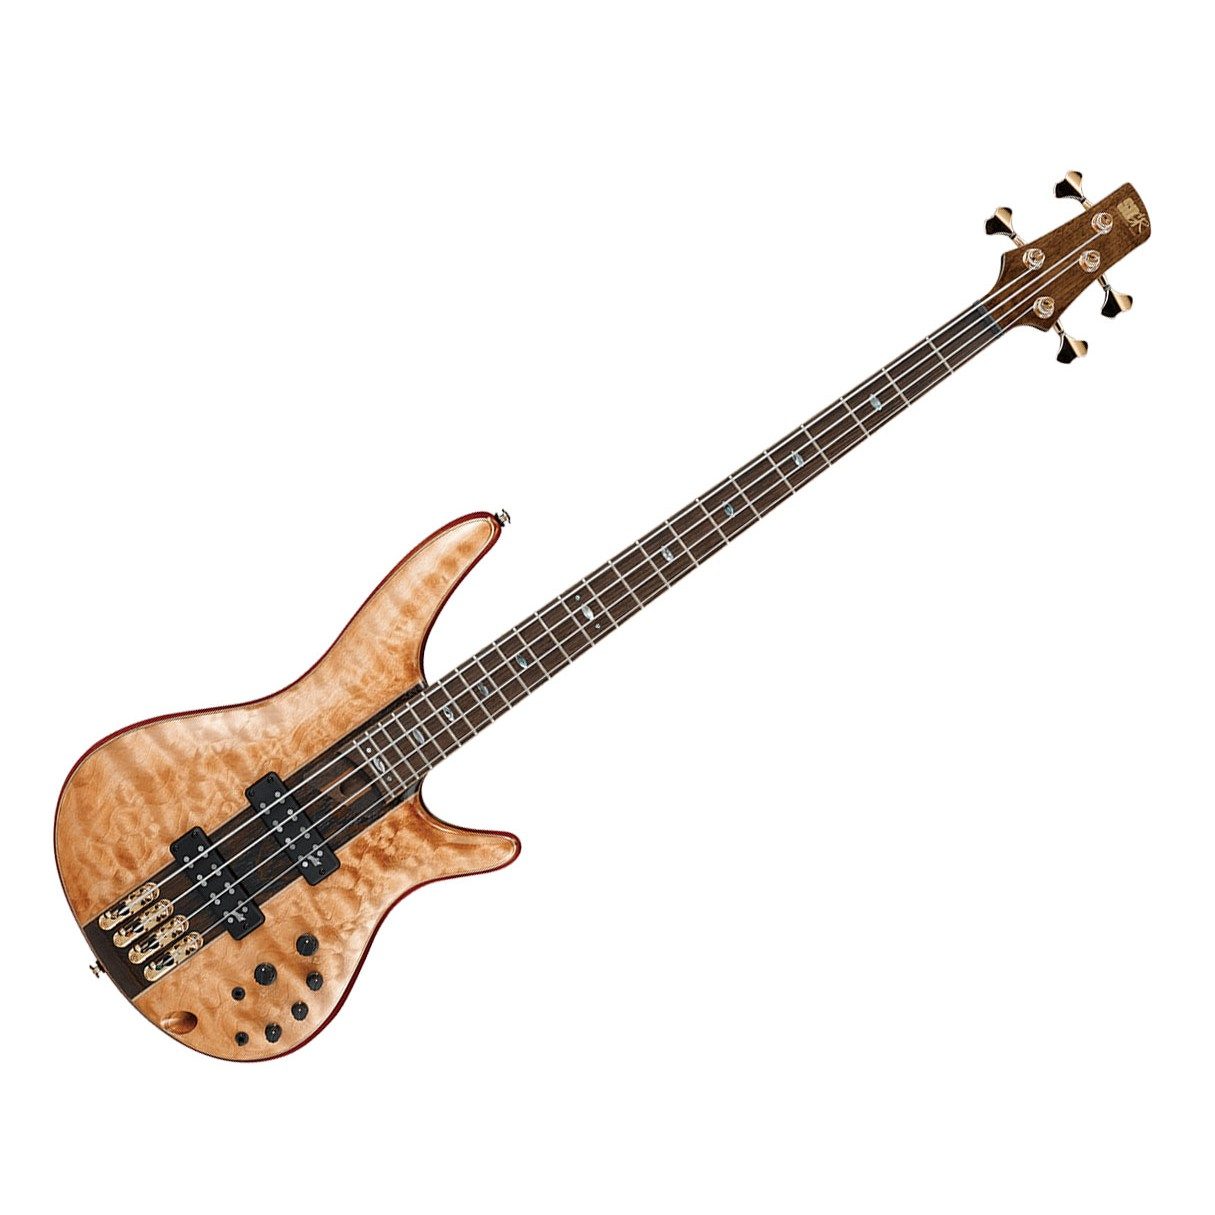 ibanez sr2400fnl sr premium 4 string electric bass florid natural low gloss. Black Bedroom Furniture Sets. Home Design Ideas